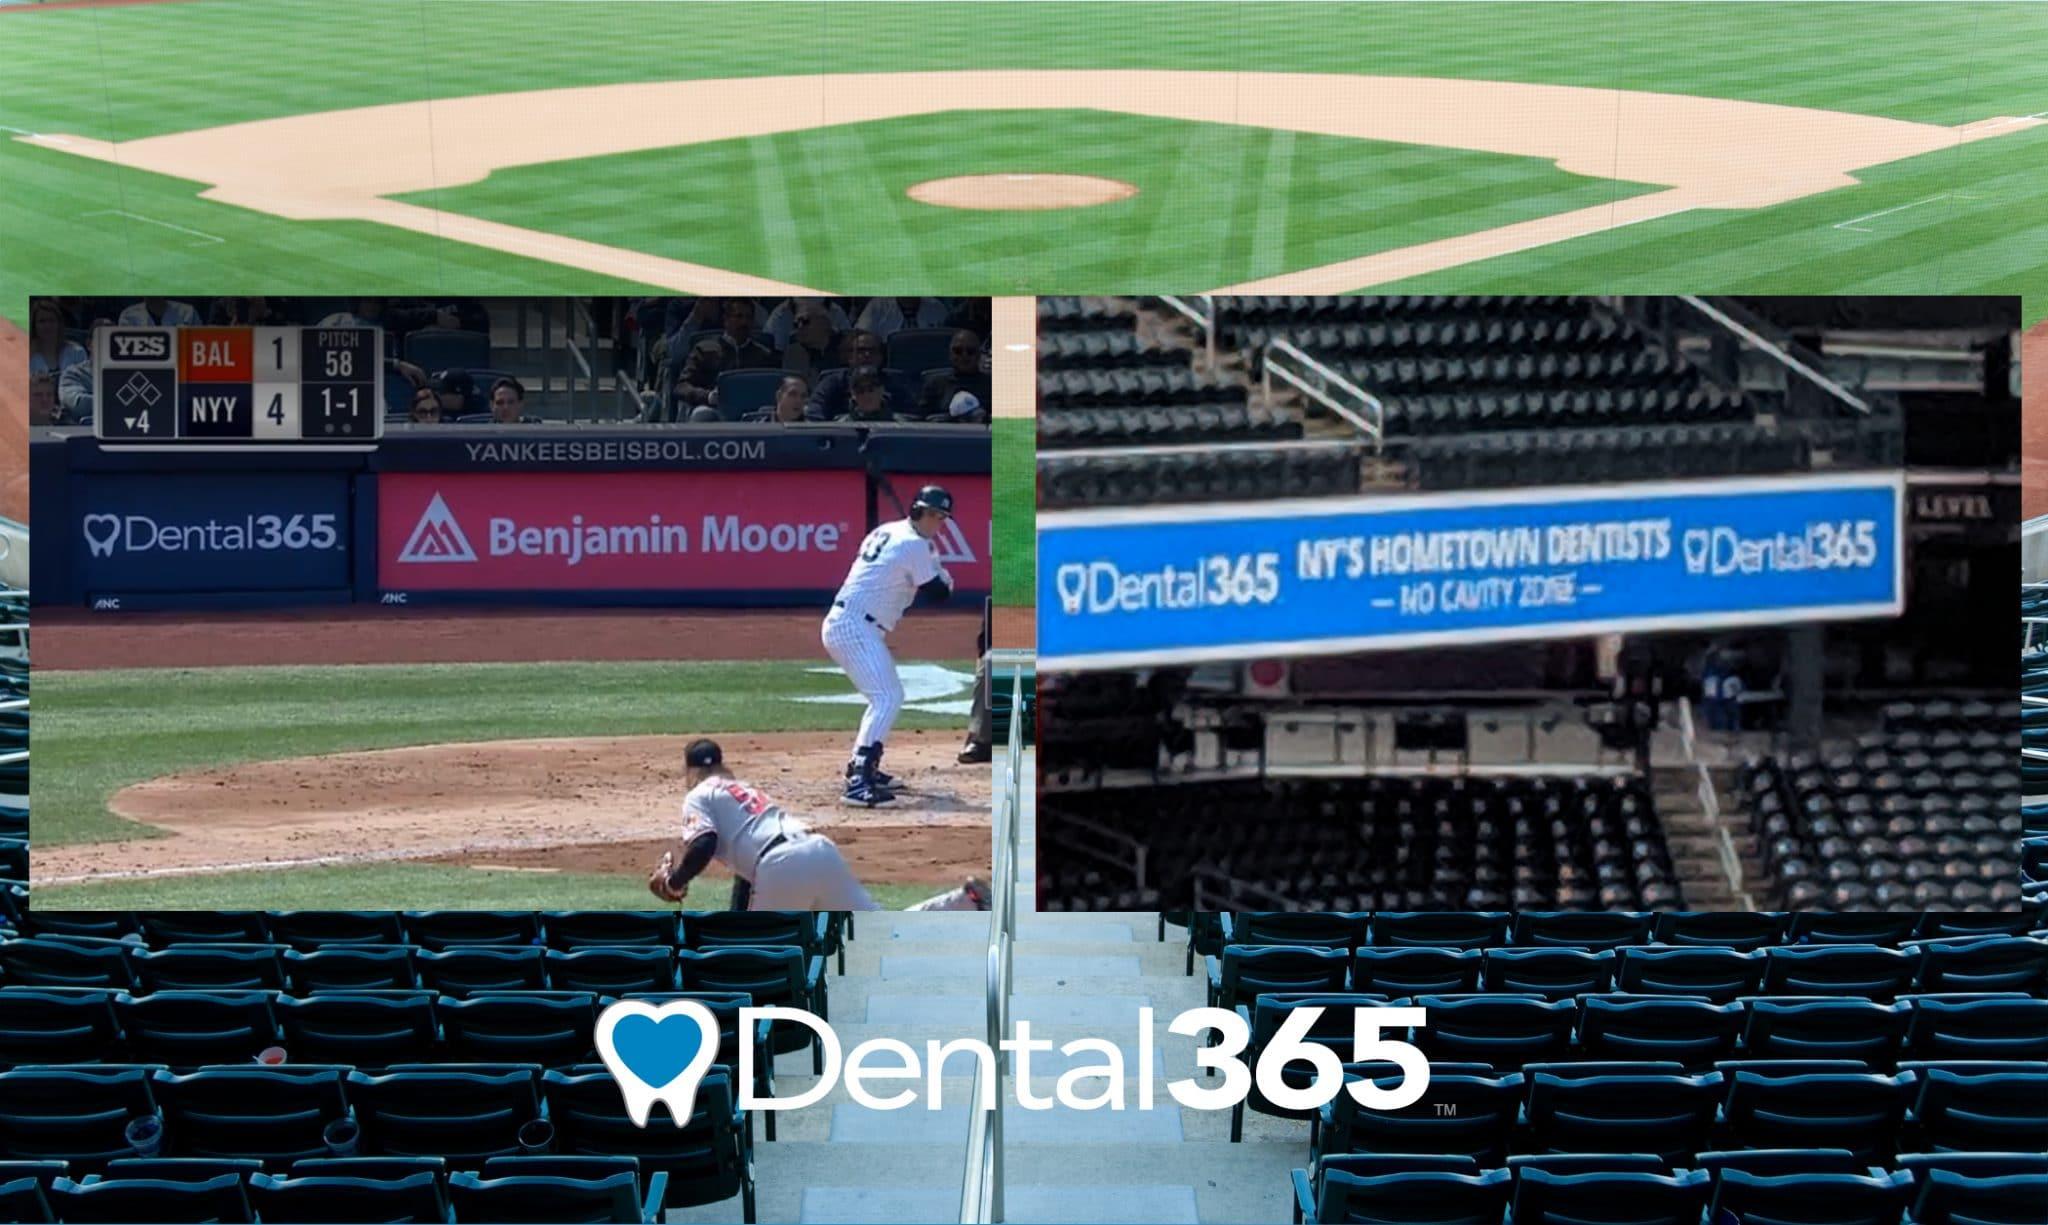 Dental365 signage at Yankee Stadium and Citi Field.